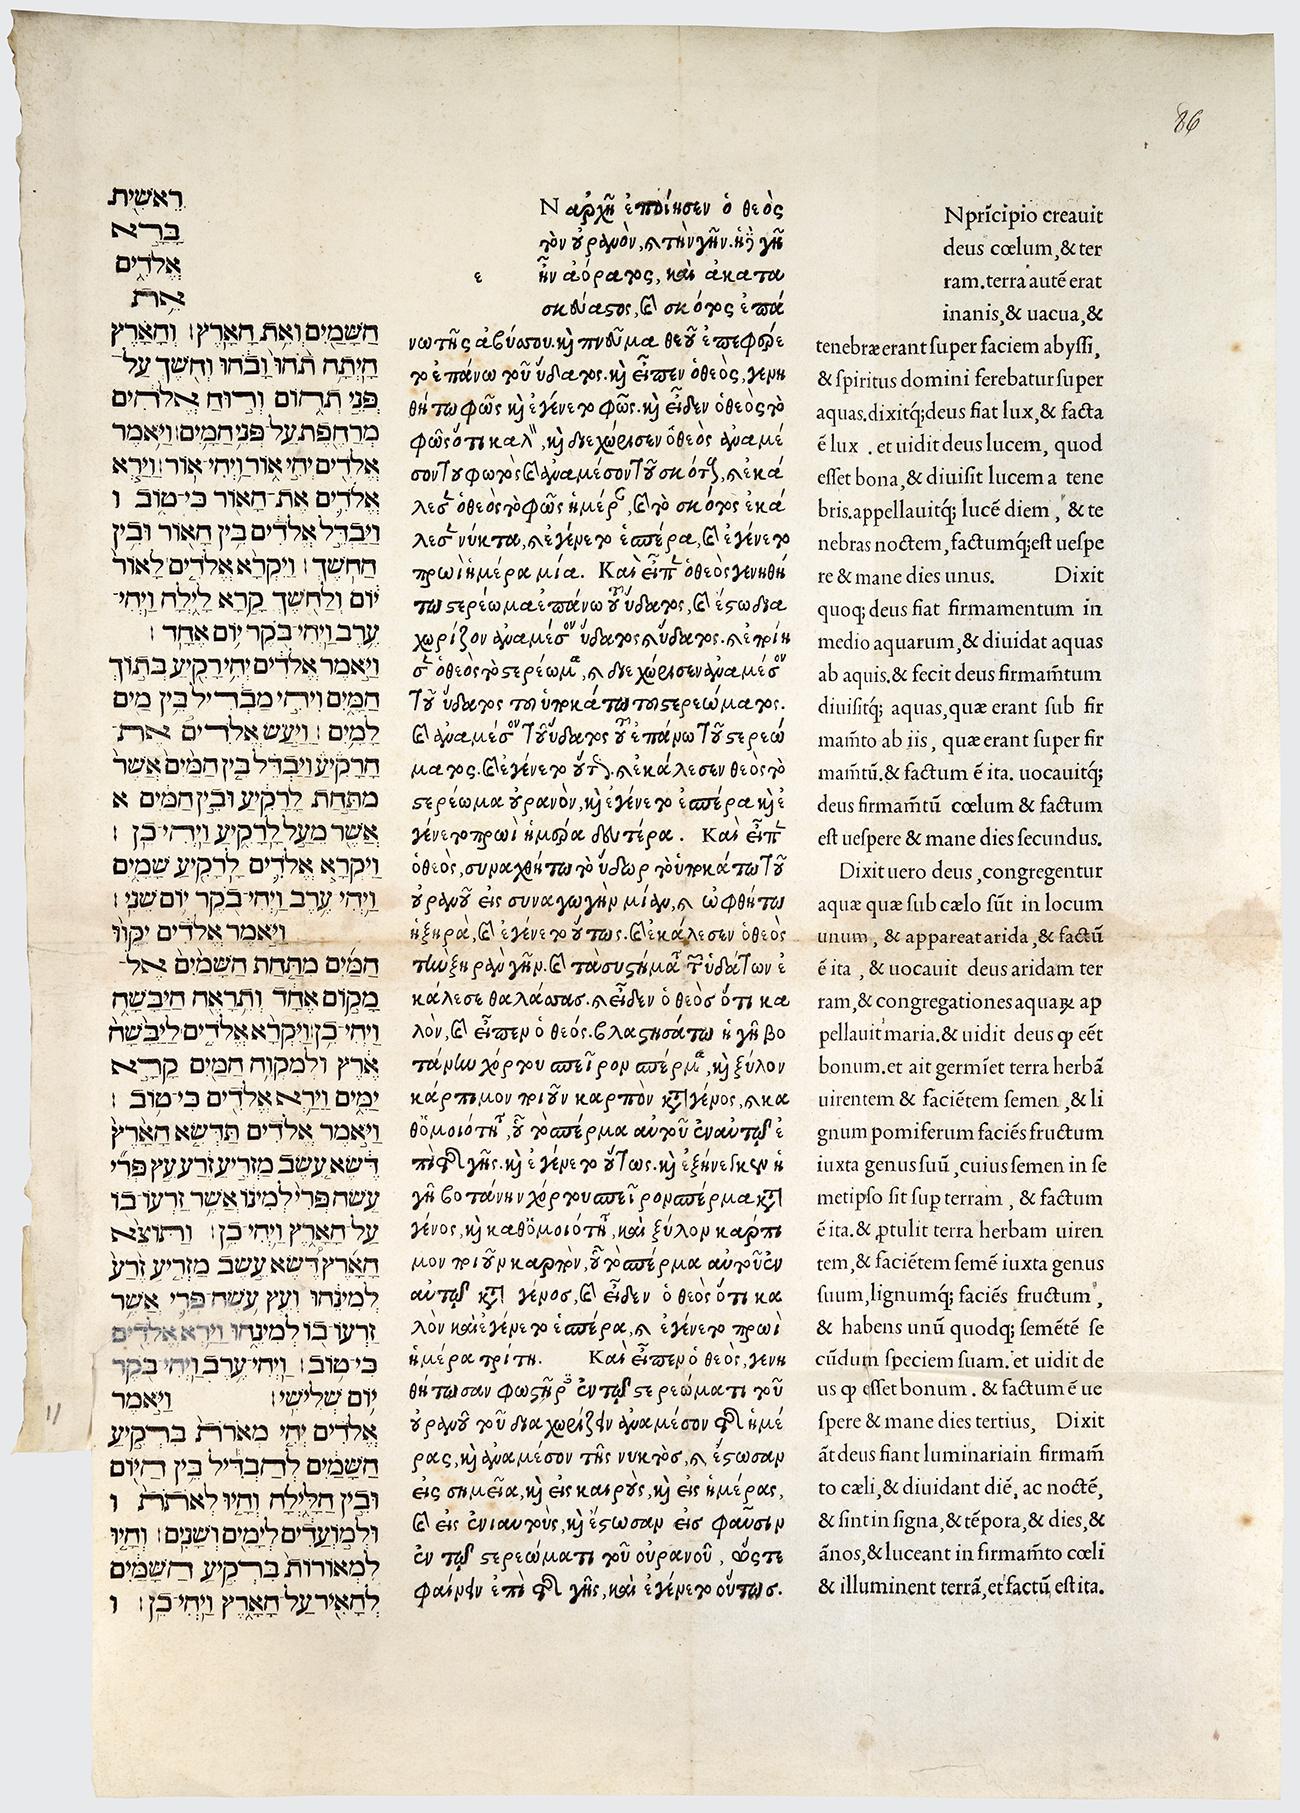 Bibbia Poliglotta, Aldo Manuzio, 1498-1501, Bibliothèque Nationale de France